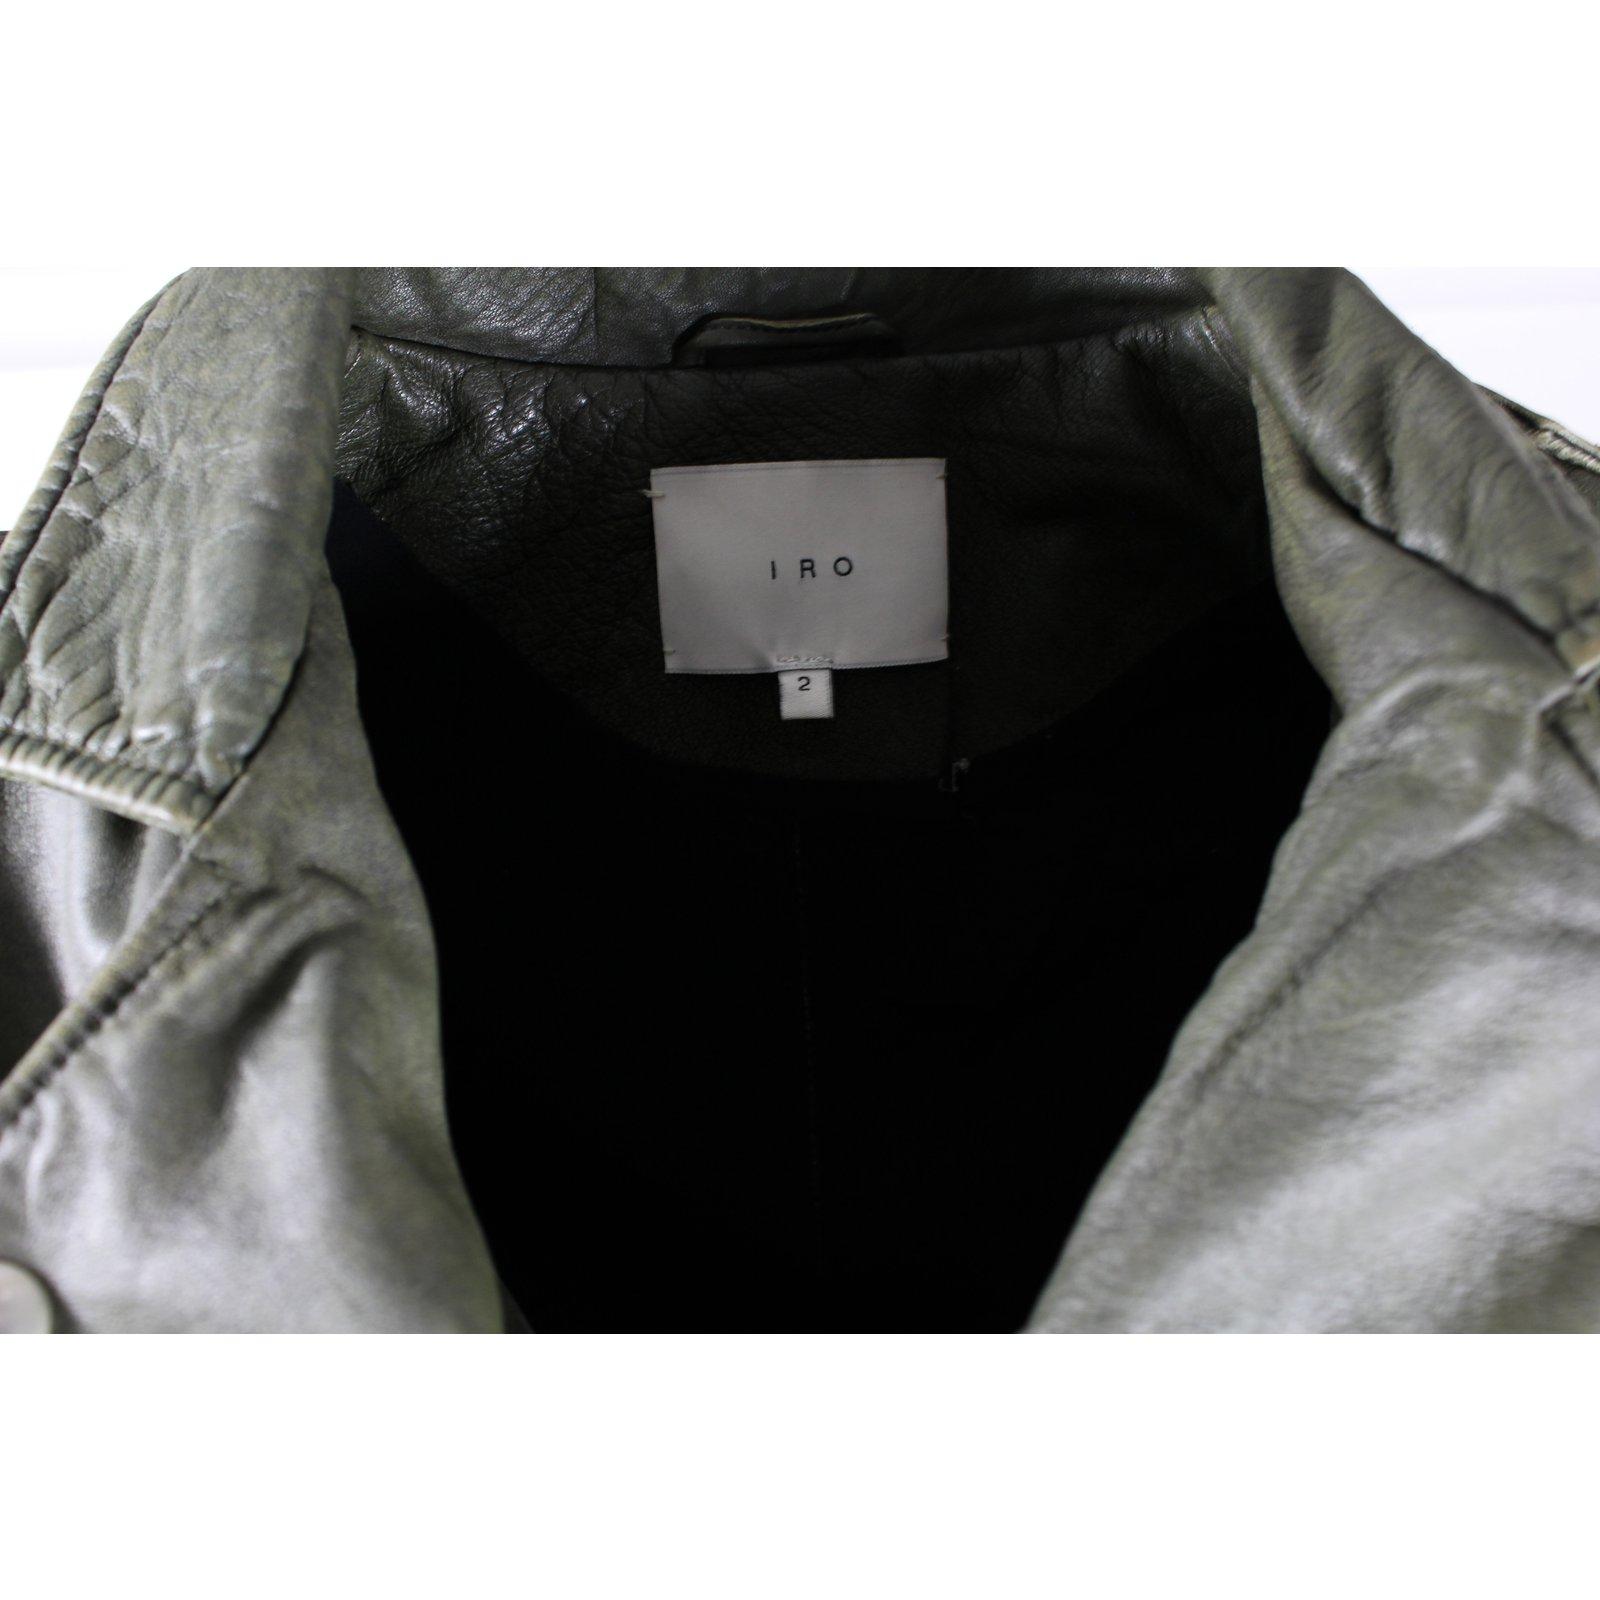 Vestes Iro Perfecto cuir Cuir Kaki ref.8718 Joli Closet